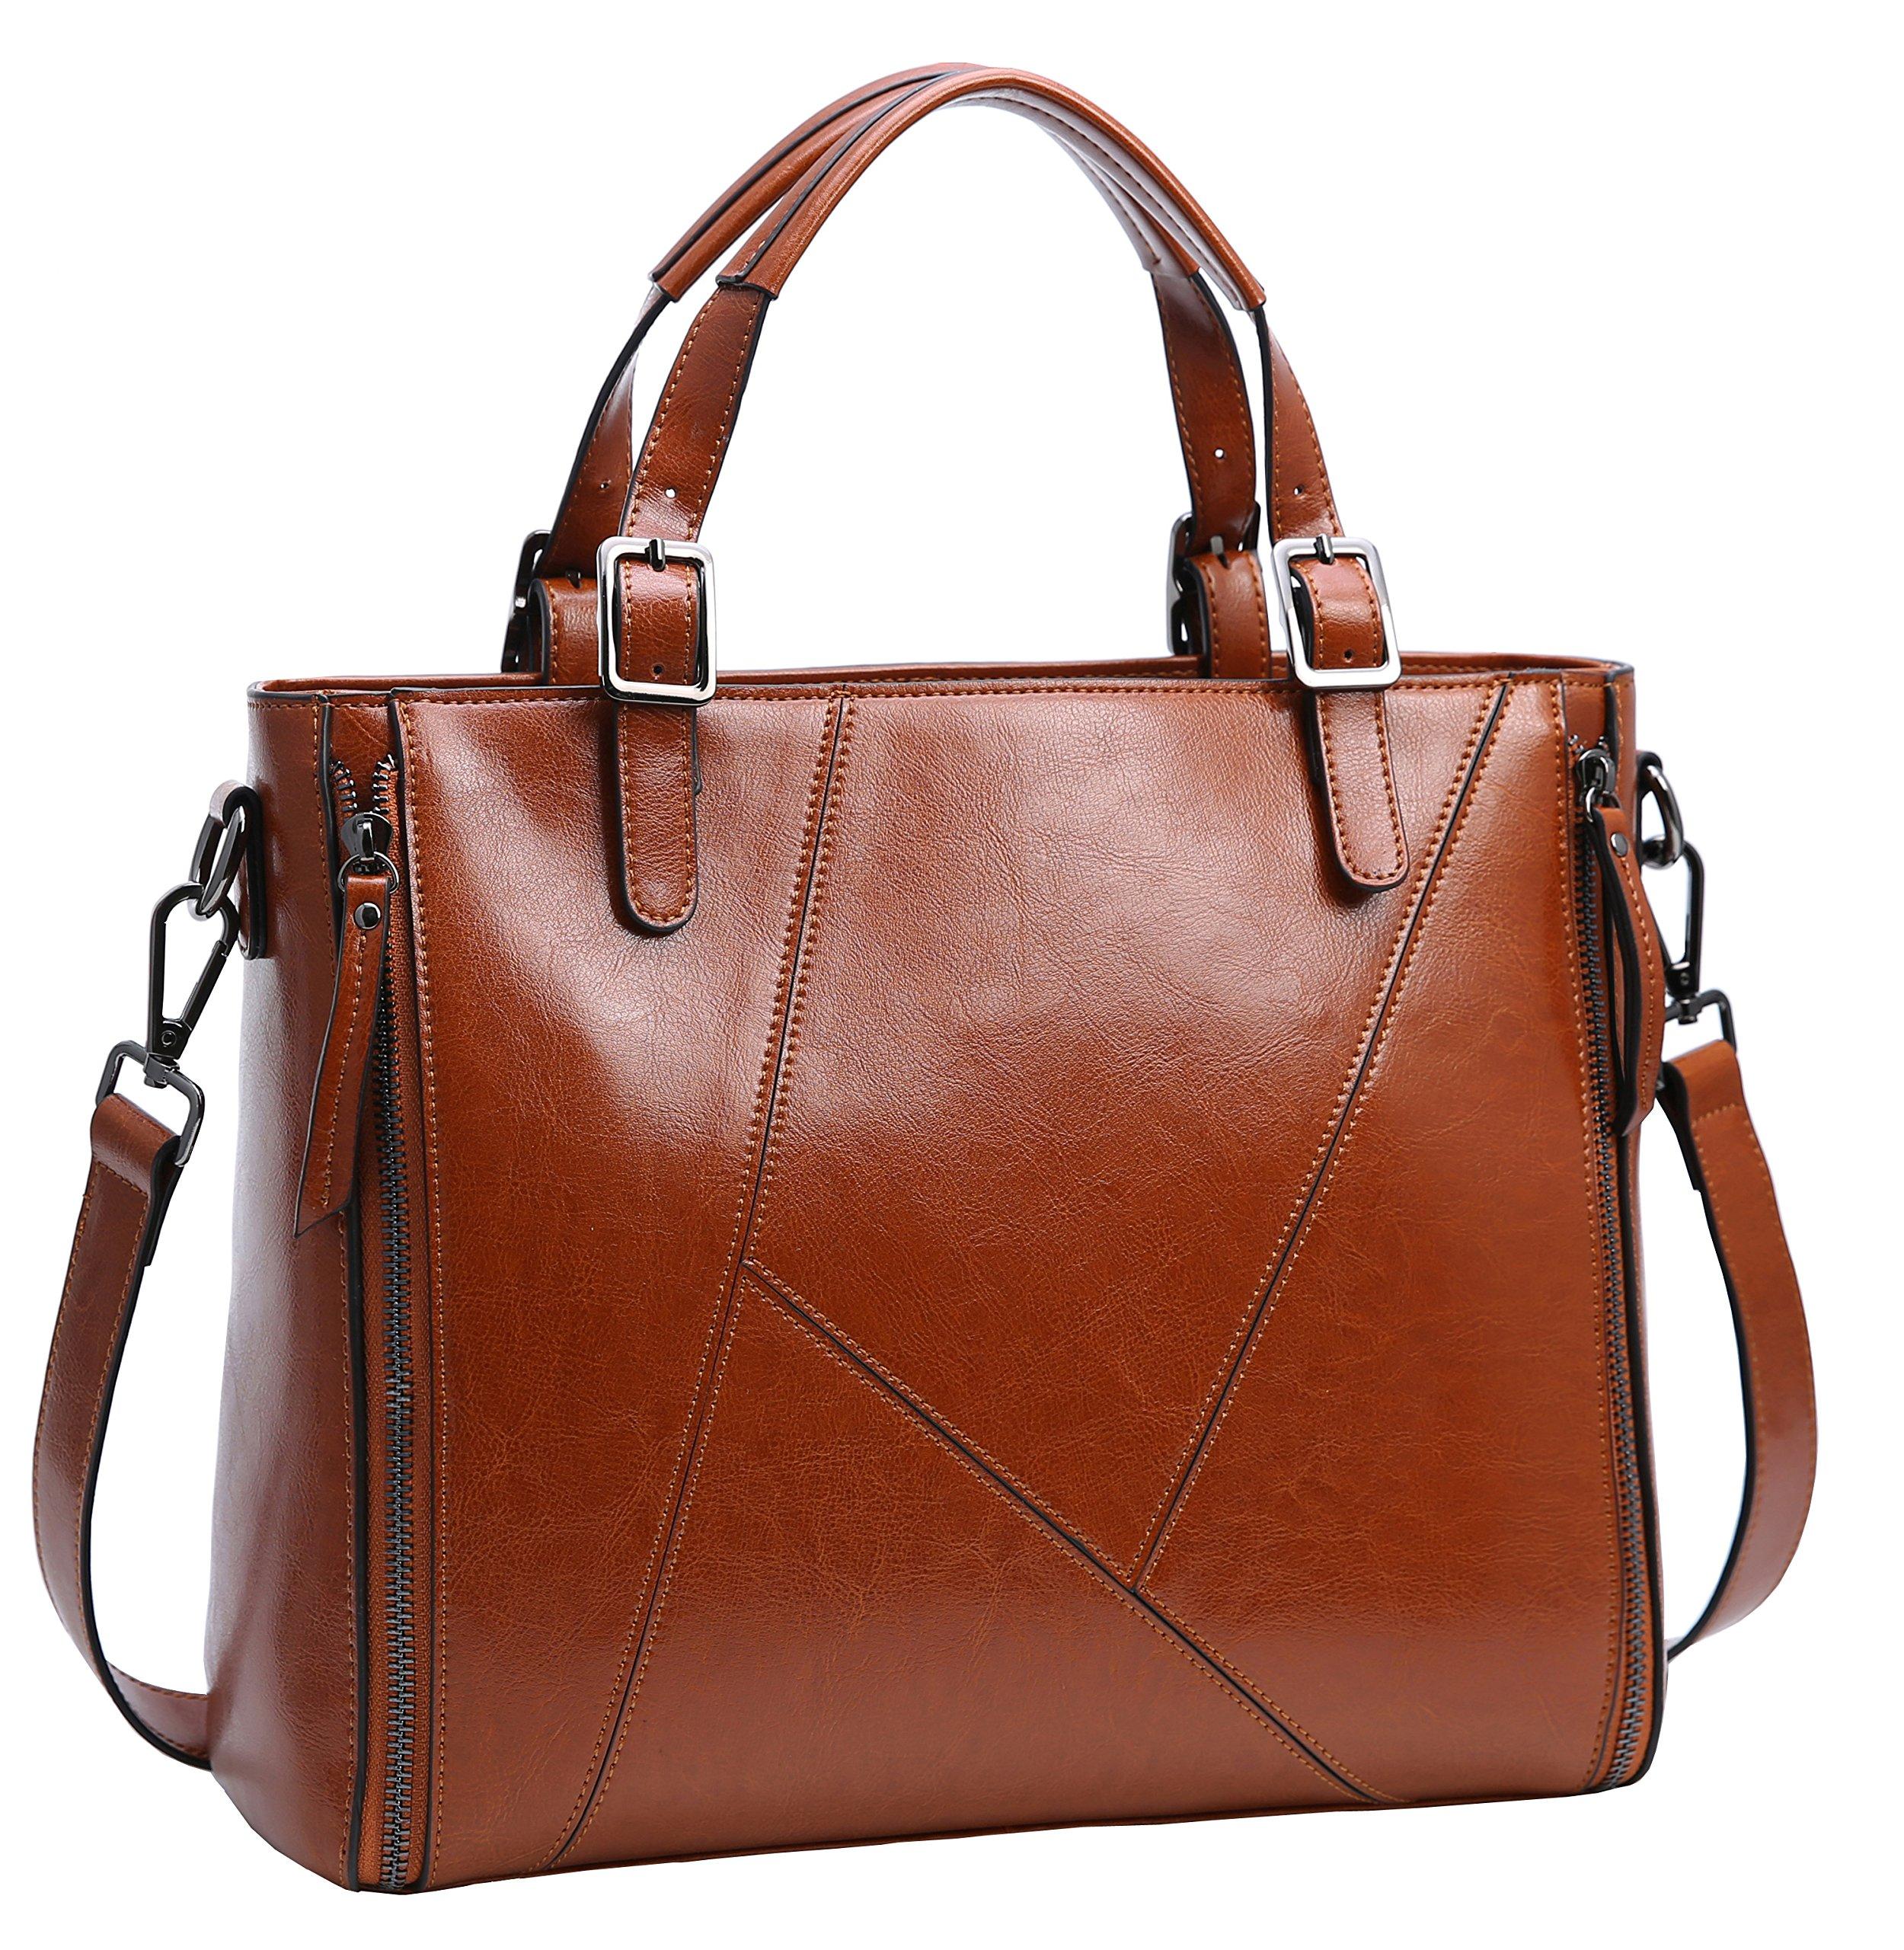 Iswee Women's Genuine leather Handbag Urban Style Tote Top Handle Shoulder Bag Vintage Satchel Purse (Brown-08)